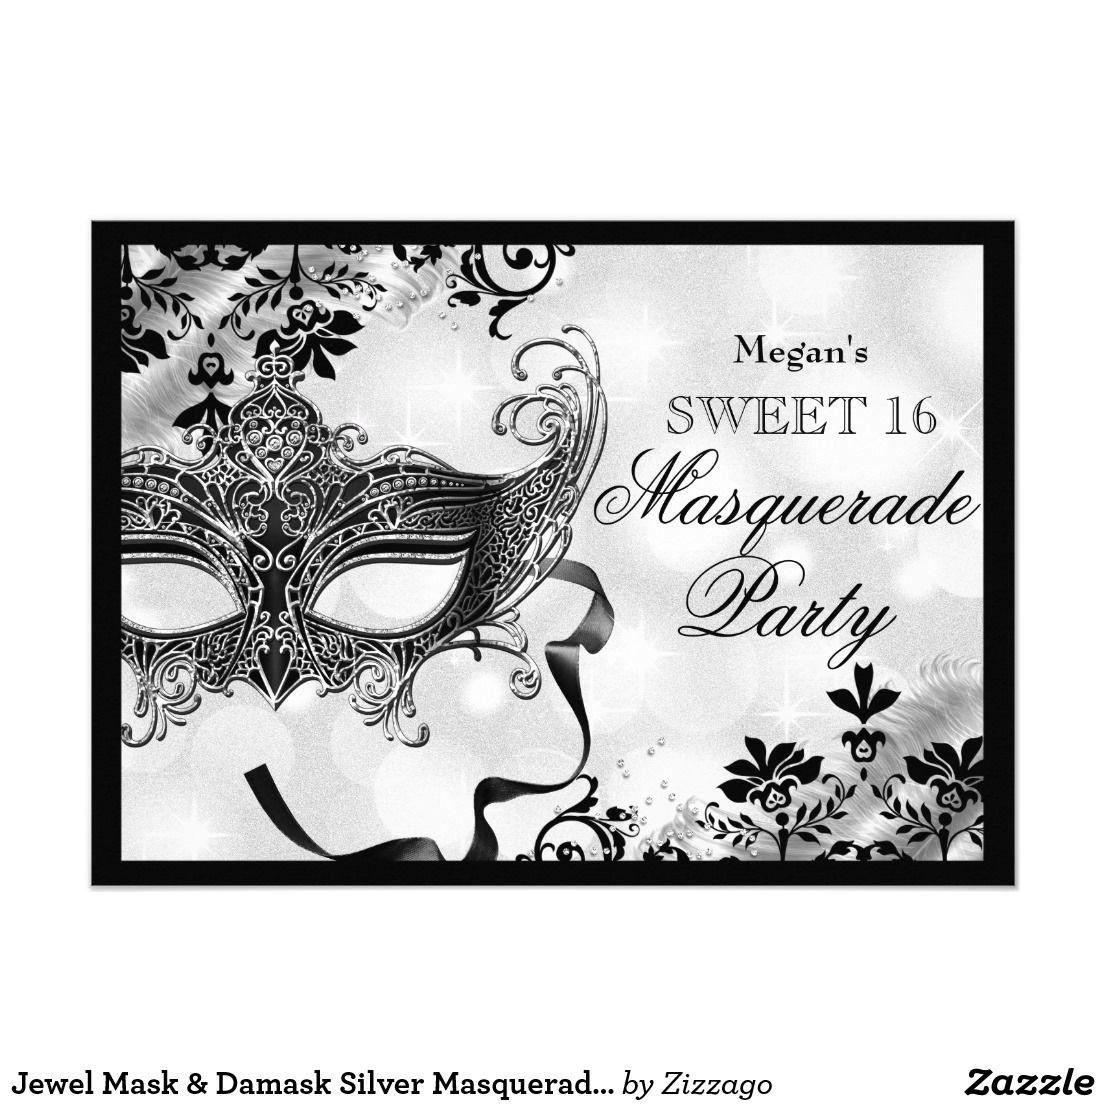 Jewel Mask & Damask Silver Masquerade Sweet 16 Invitation ...